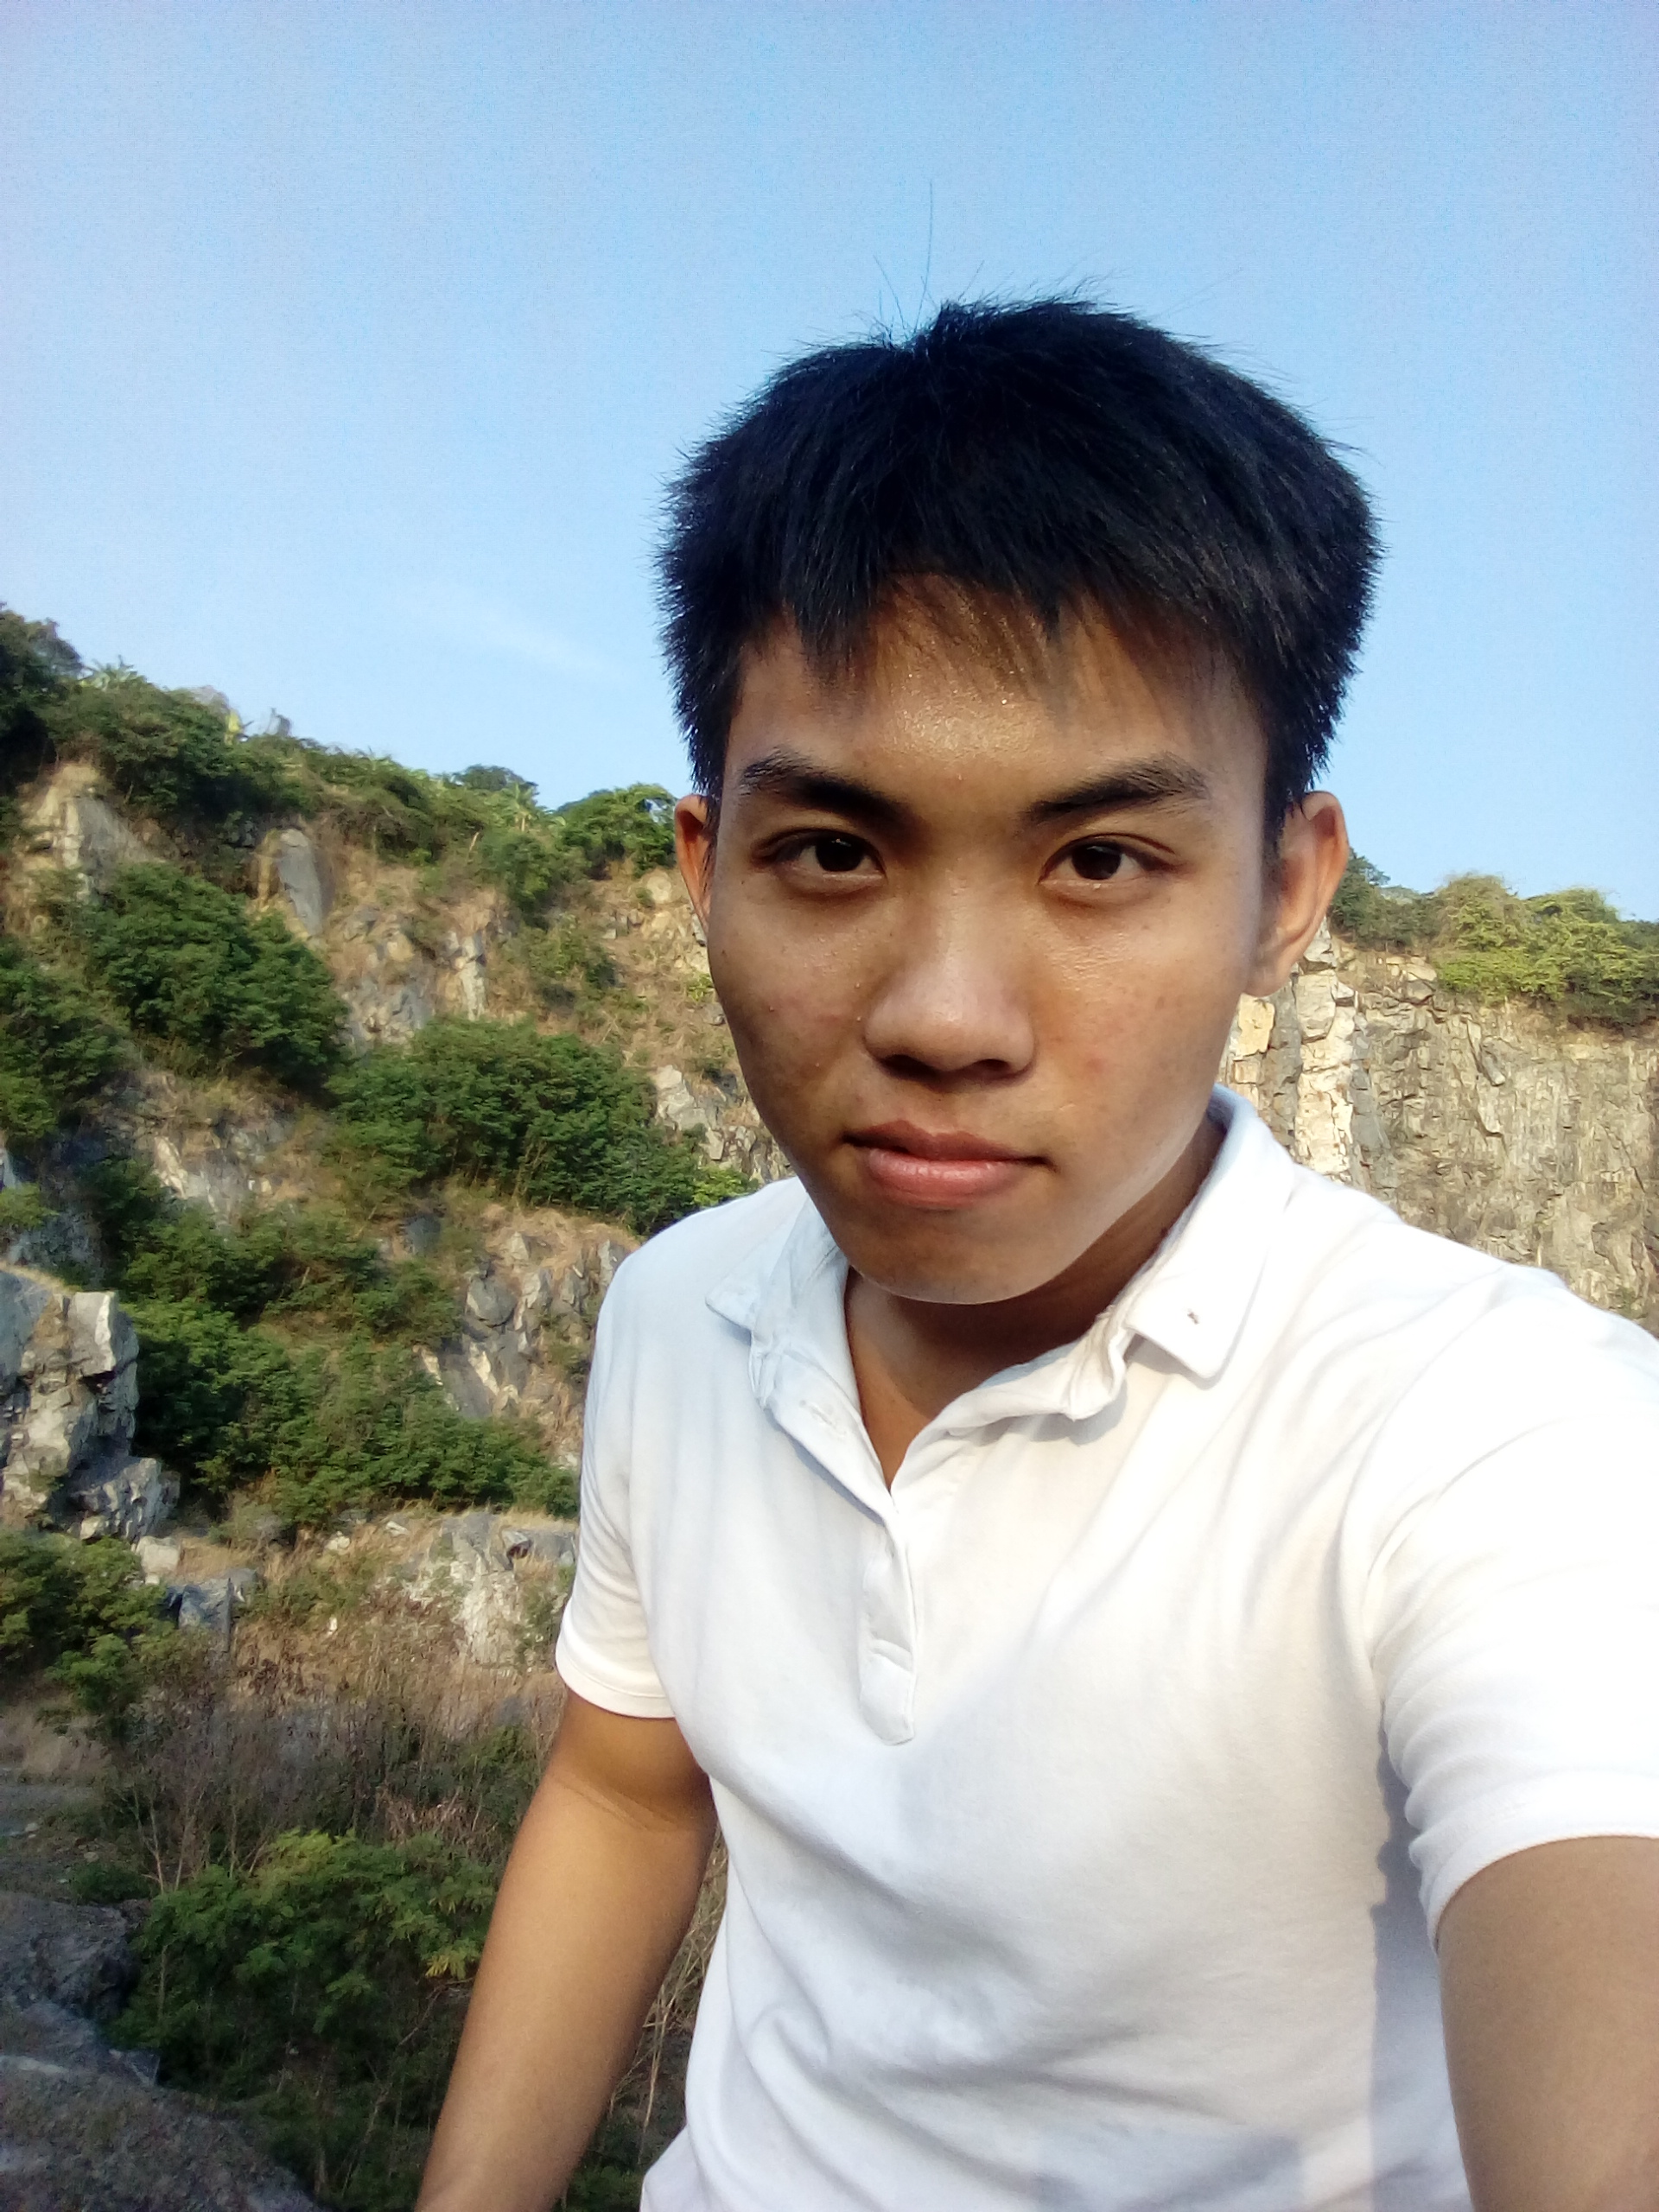 Trương Minh Bảo